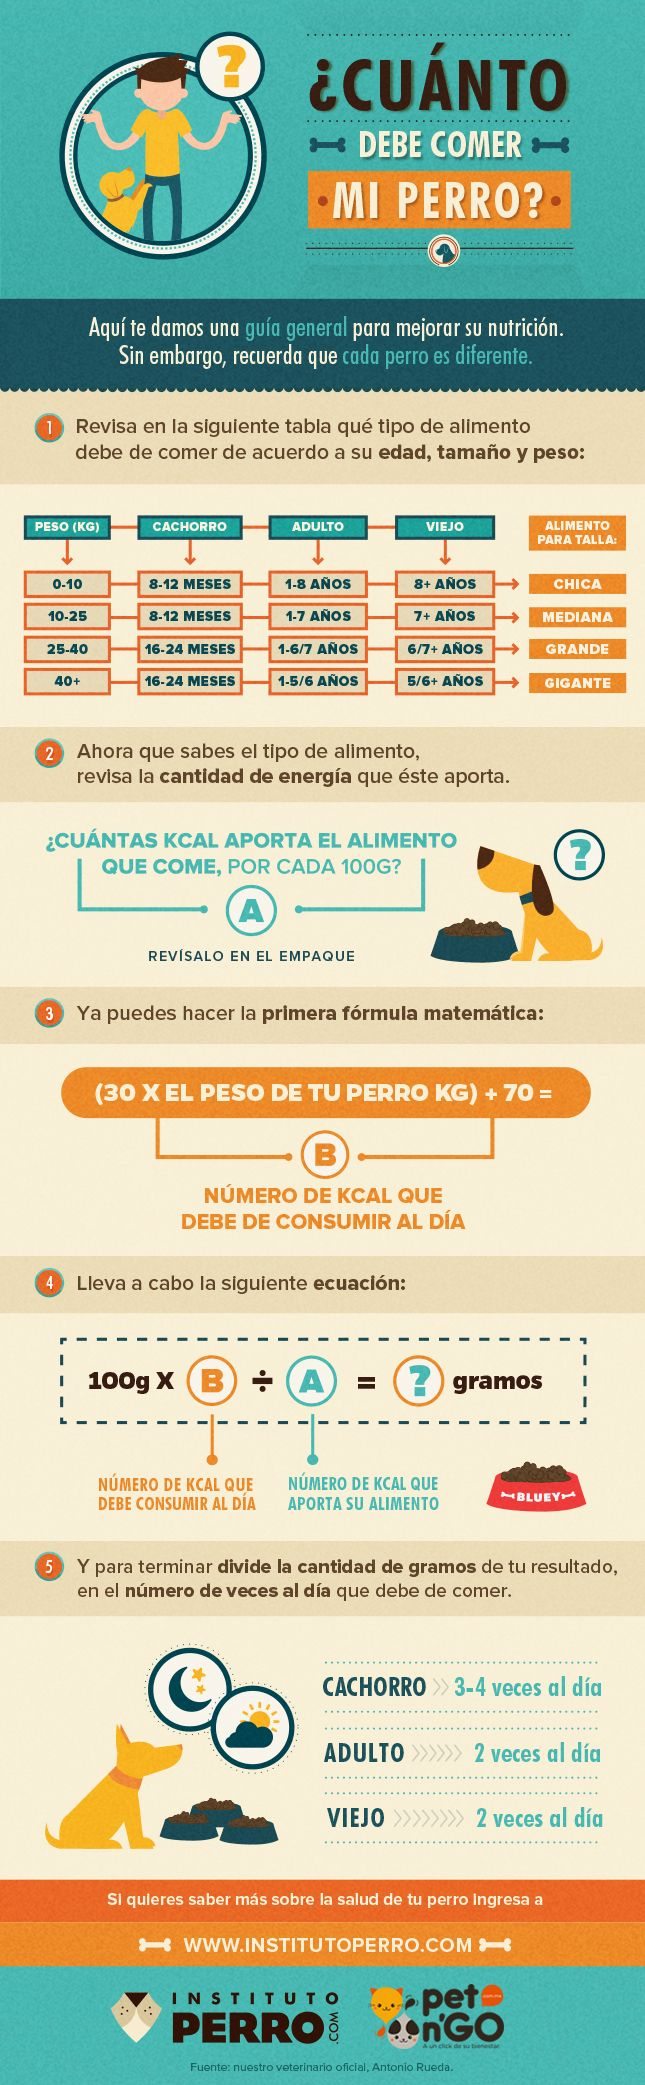 test perro ideal finest qu raza de perro deberas tener descubre qu carcter tiene tu perro. Black Bedroom Furniture Sets. Home Design Ideas